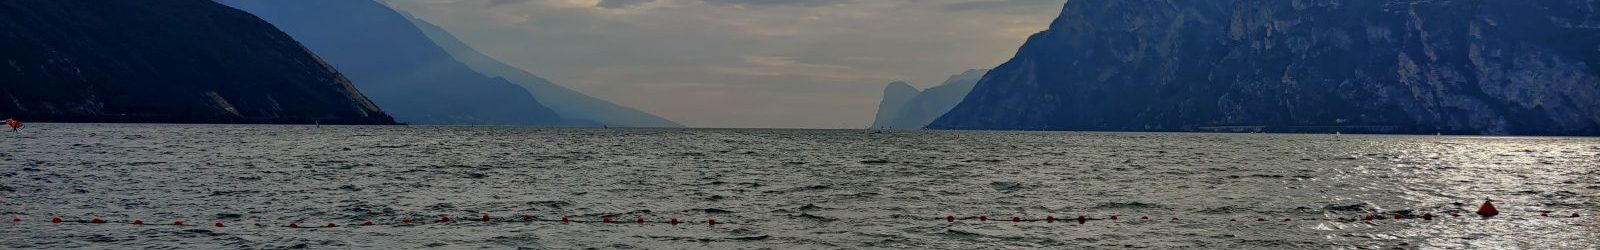 Herbst 2021 – Tag 2: Giardini und Garda (-see)